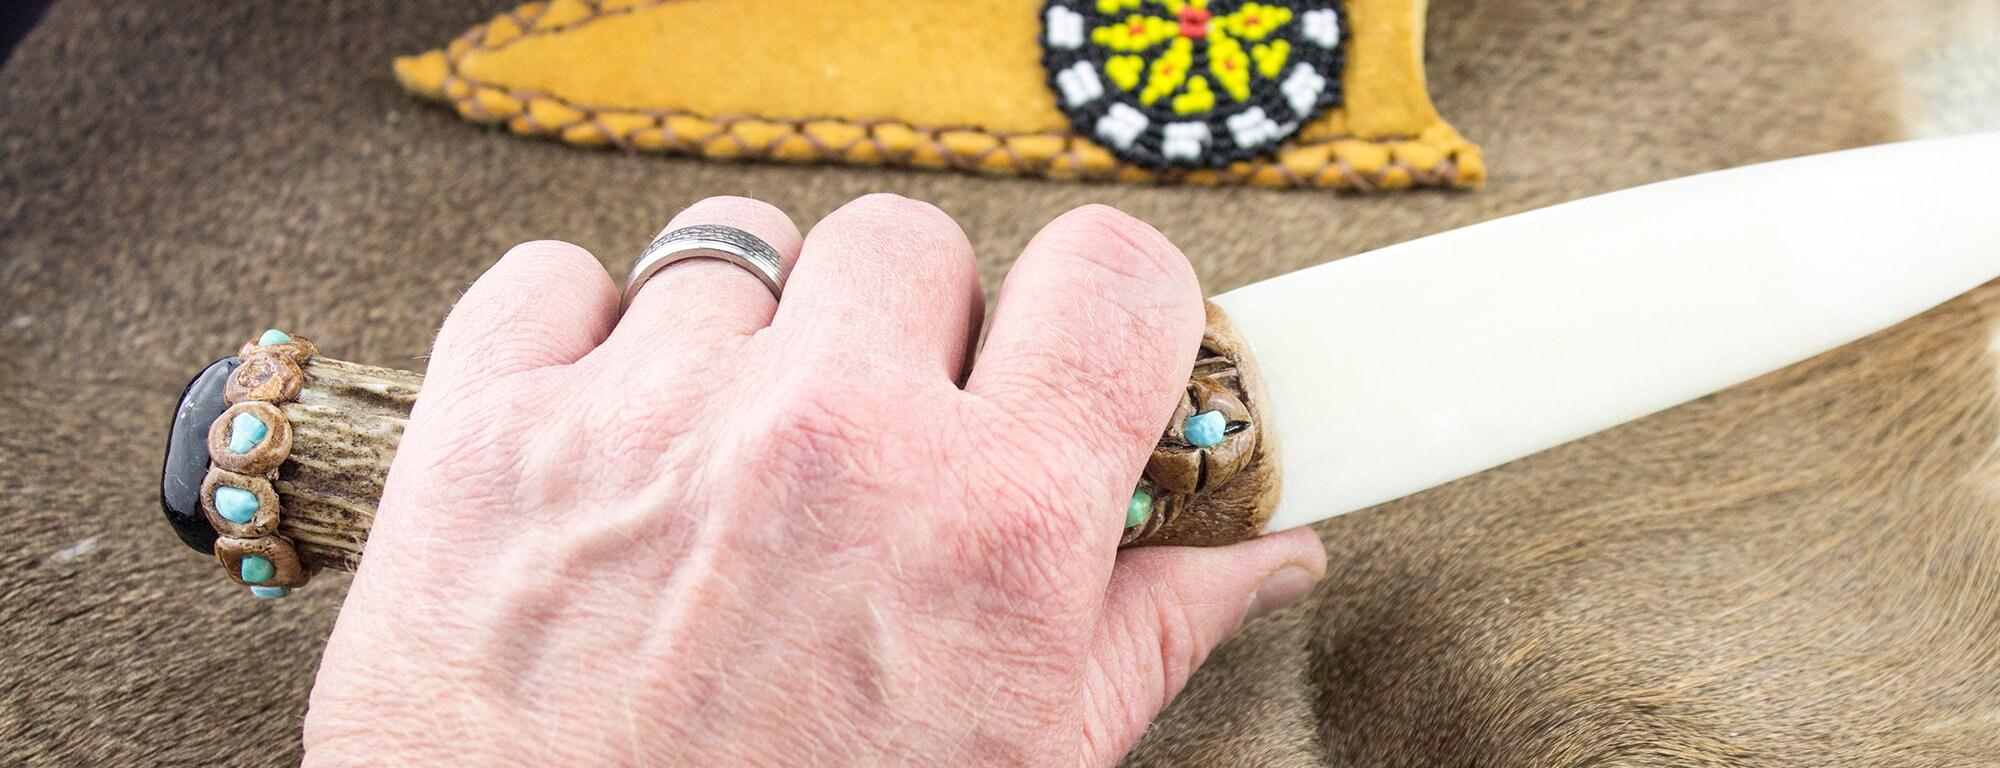 Bone Knife - Handmade Native American Deer Antler Bone Knife With ...